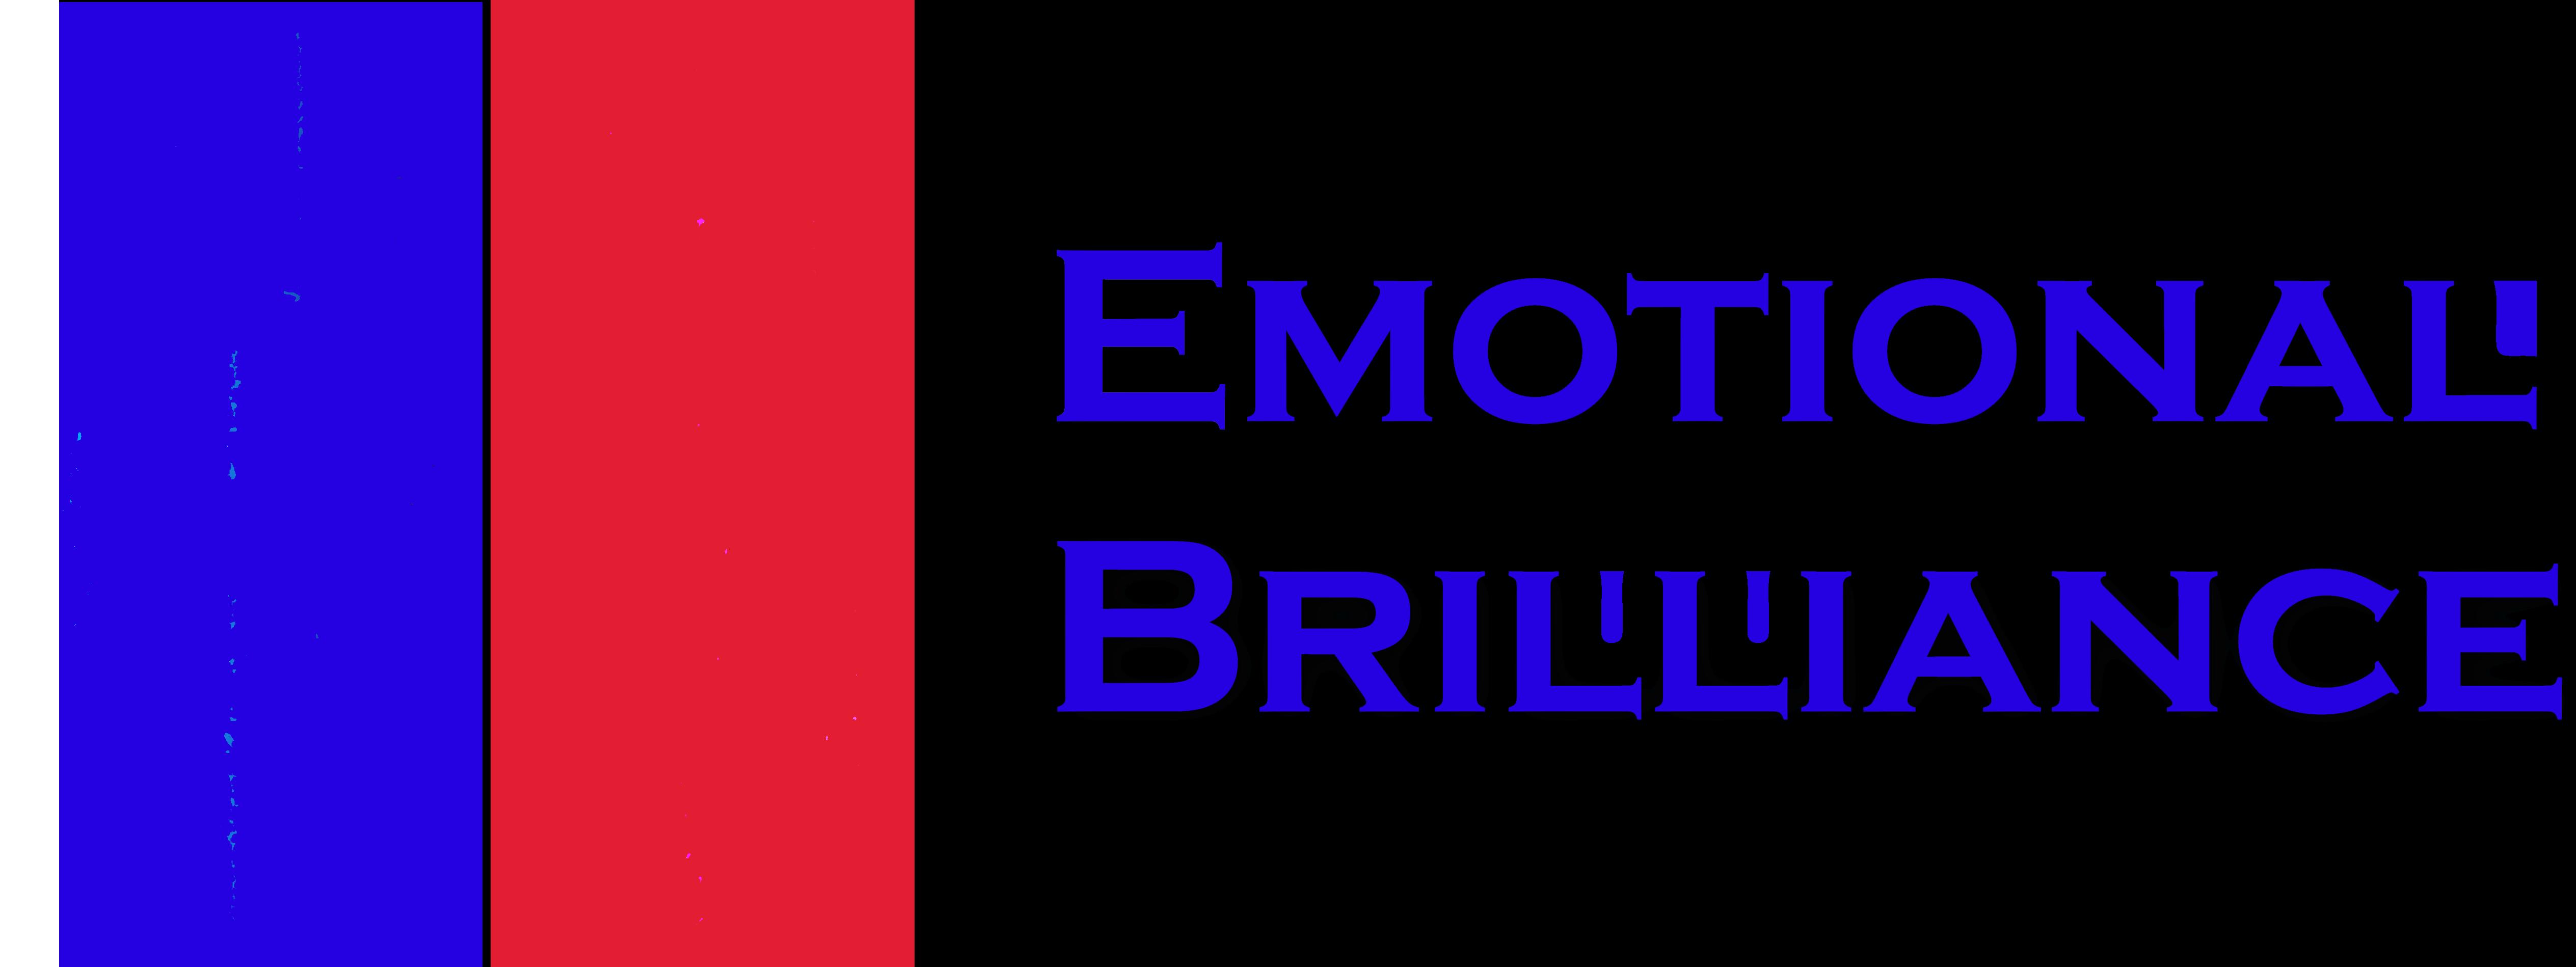 Emotional Brilliance